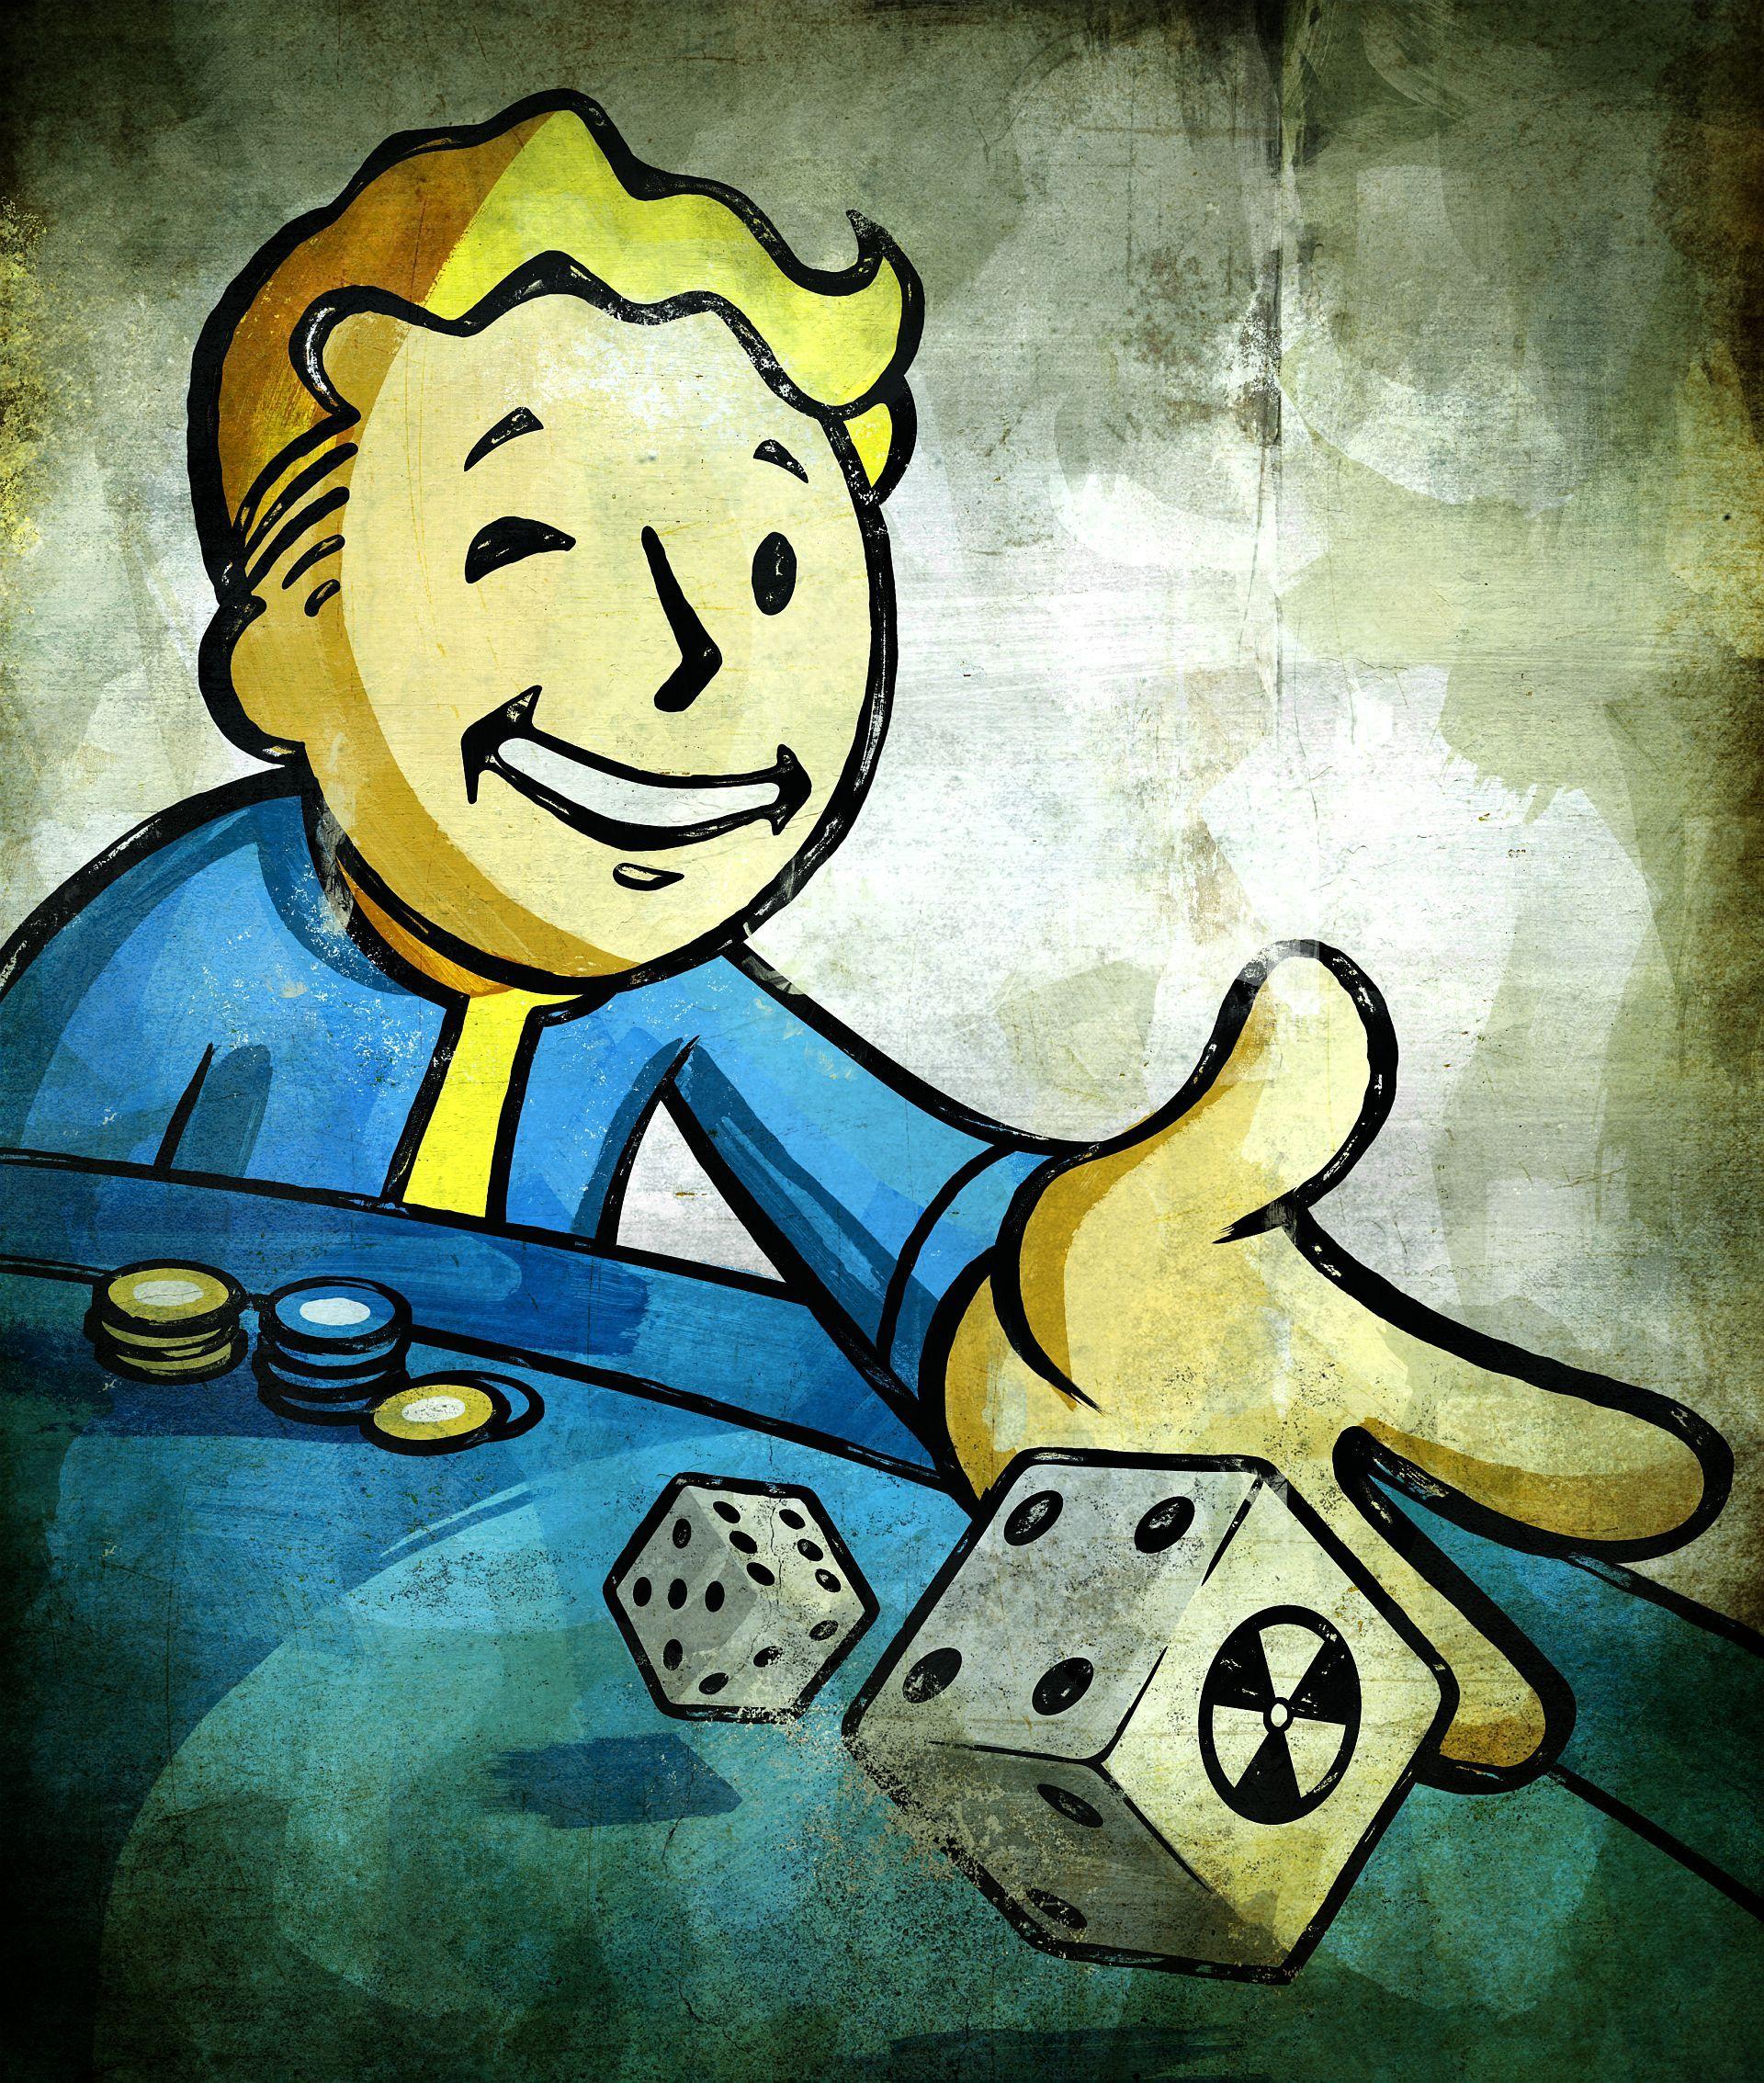 fallout vault boy dice Poster Pinterest Fallout